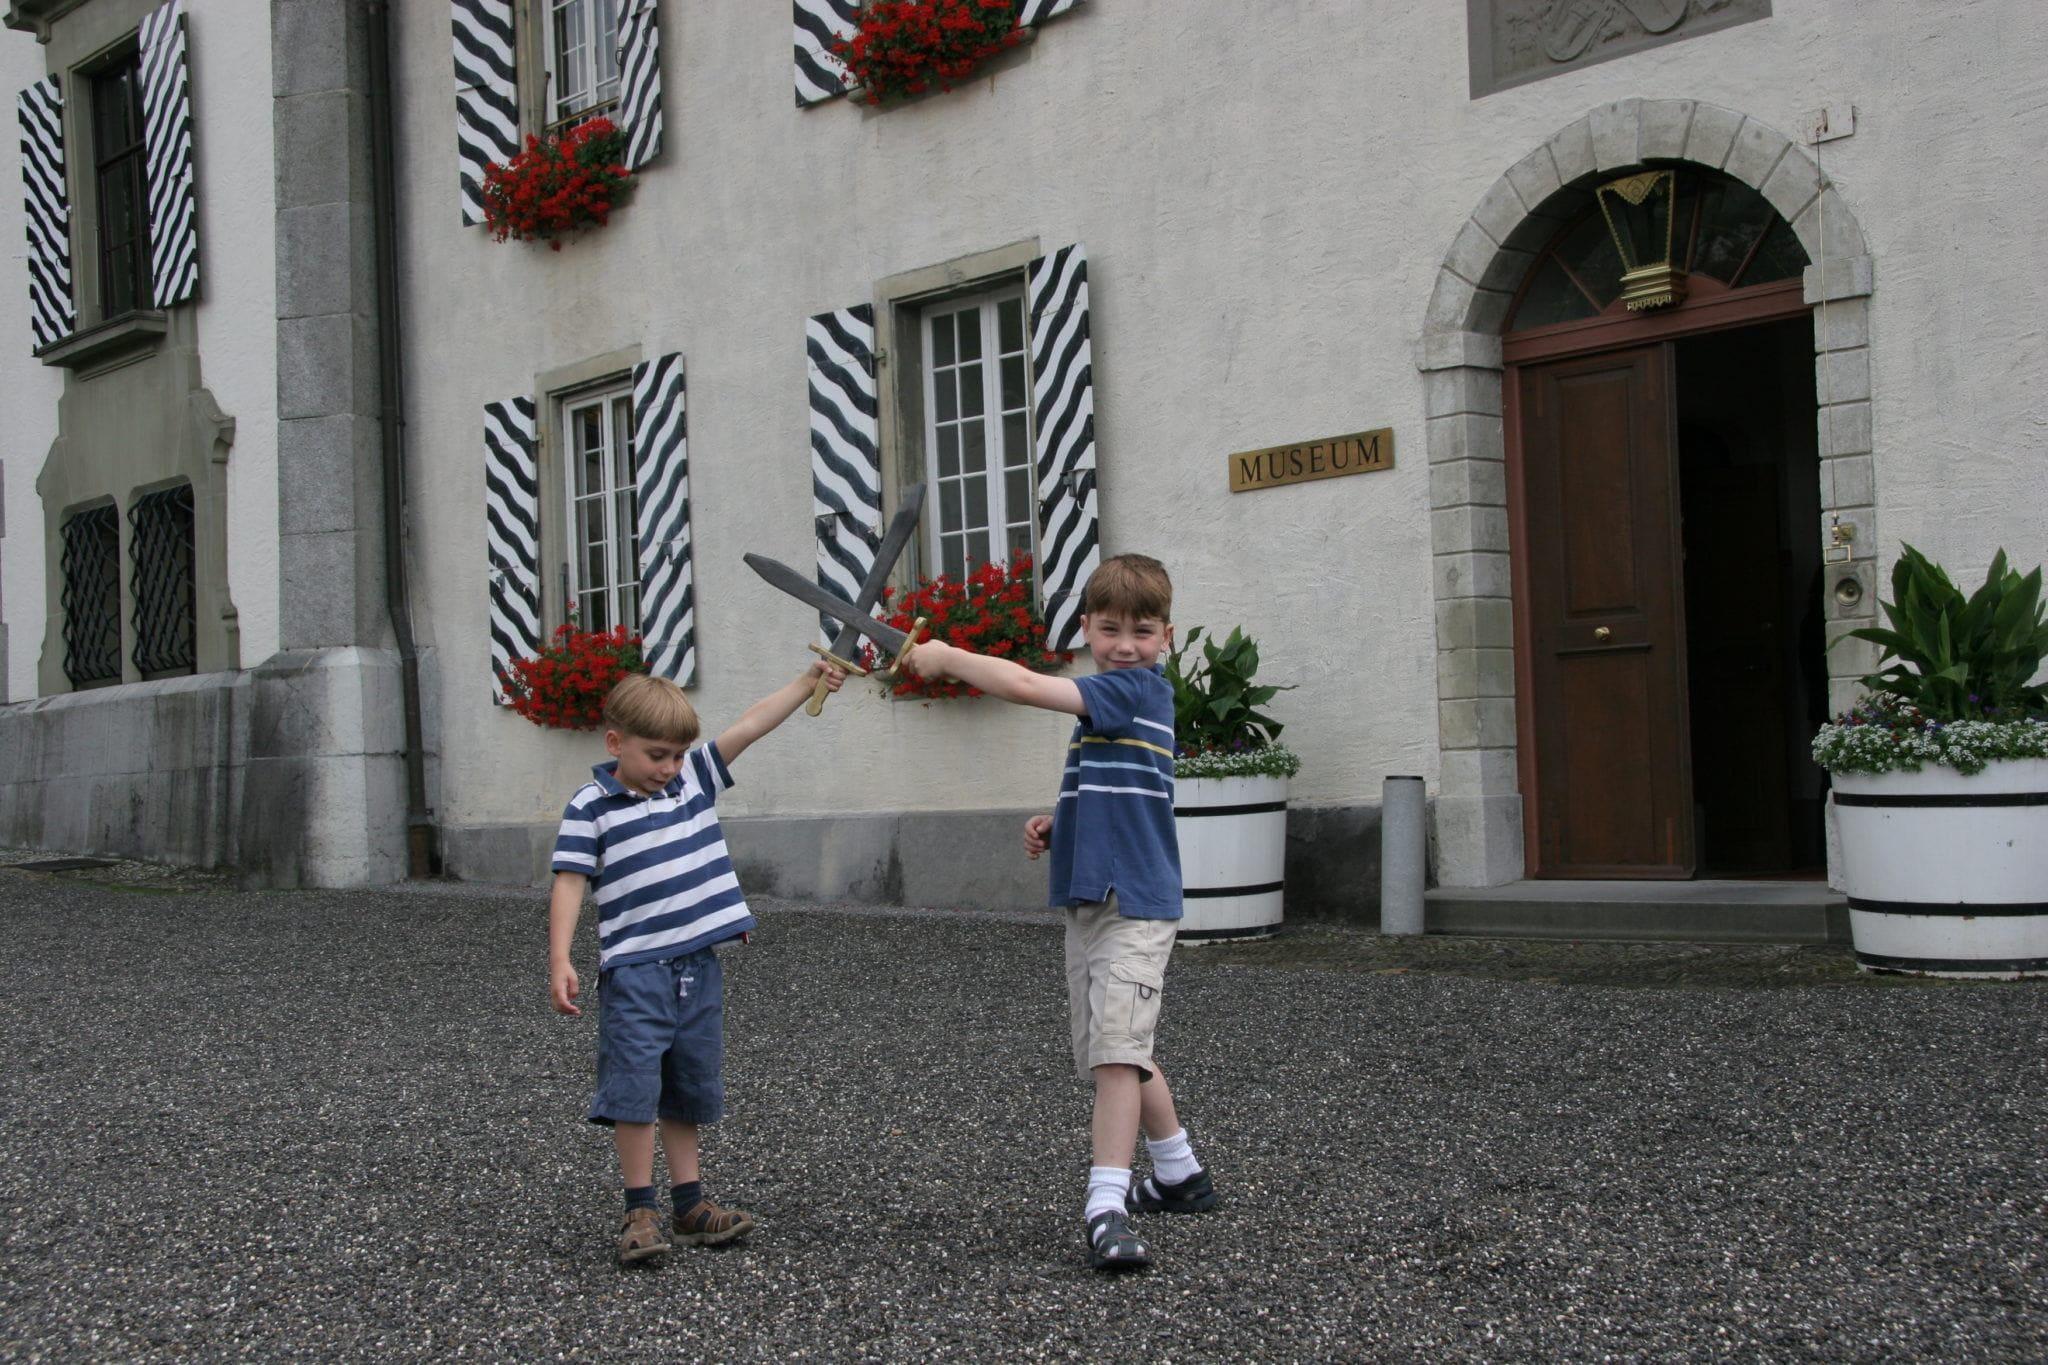 Kids' sword play in Thun, Switzerland